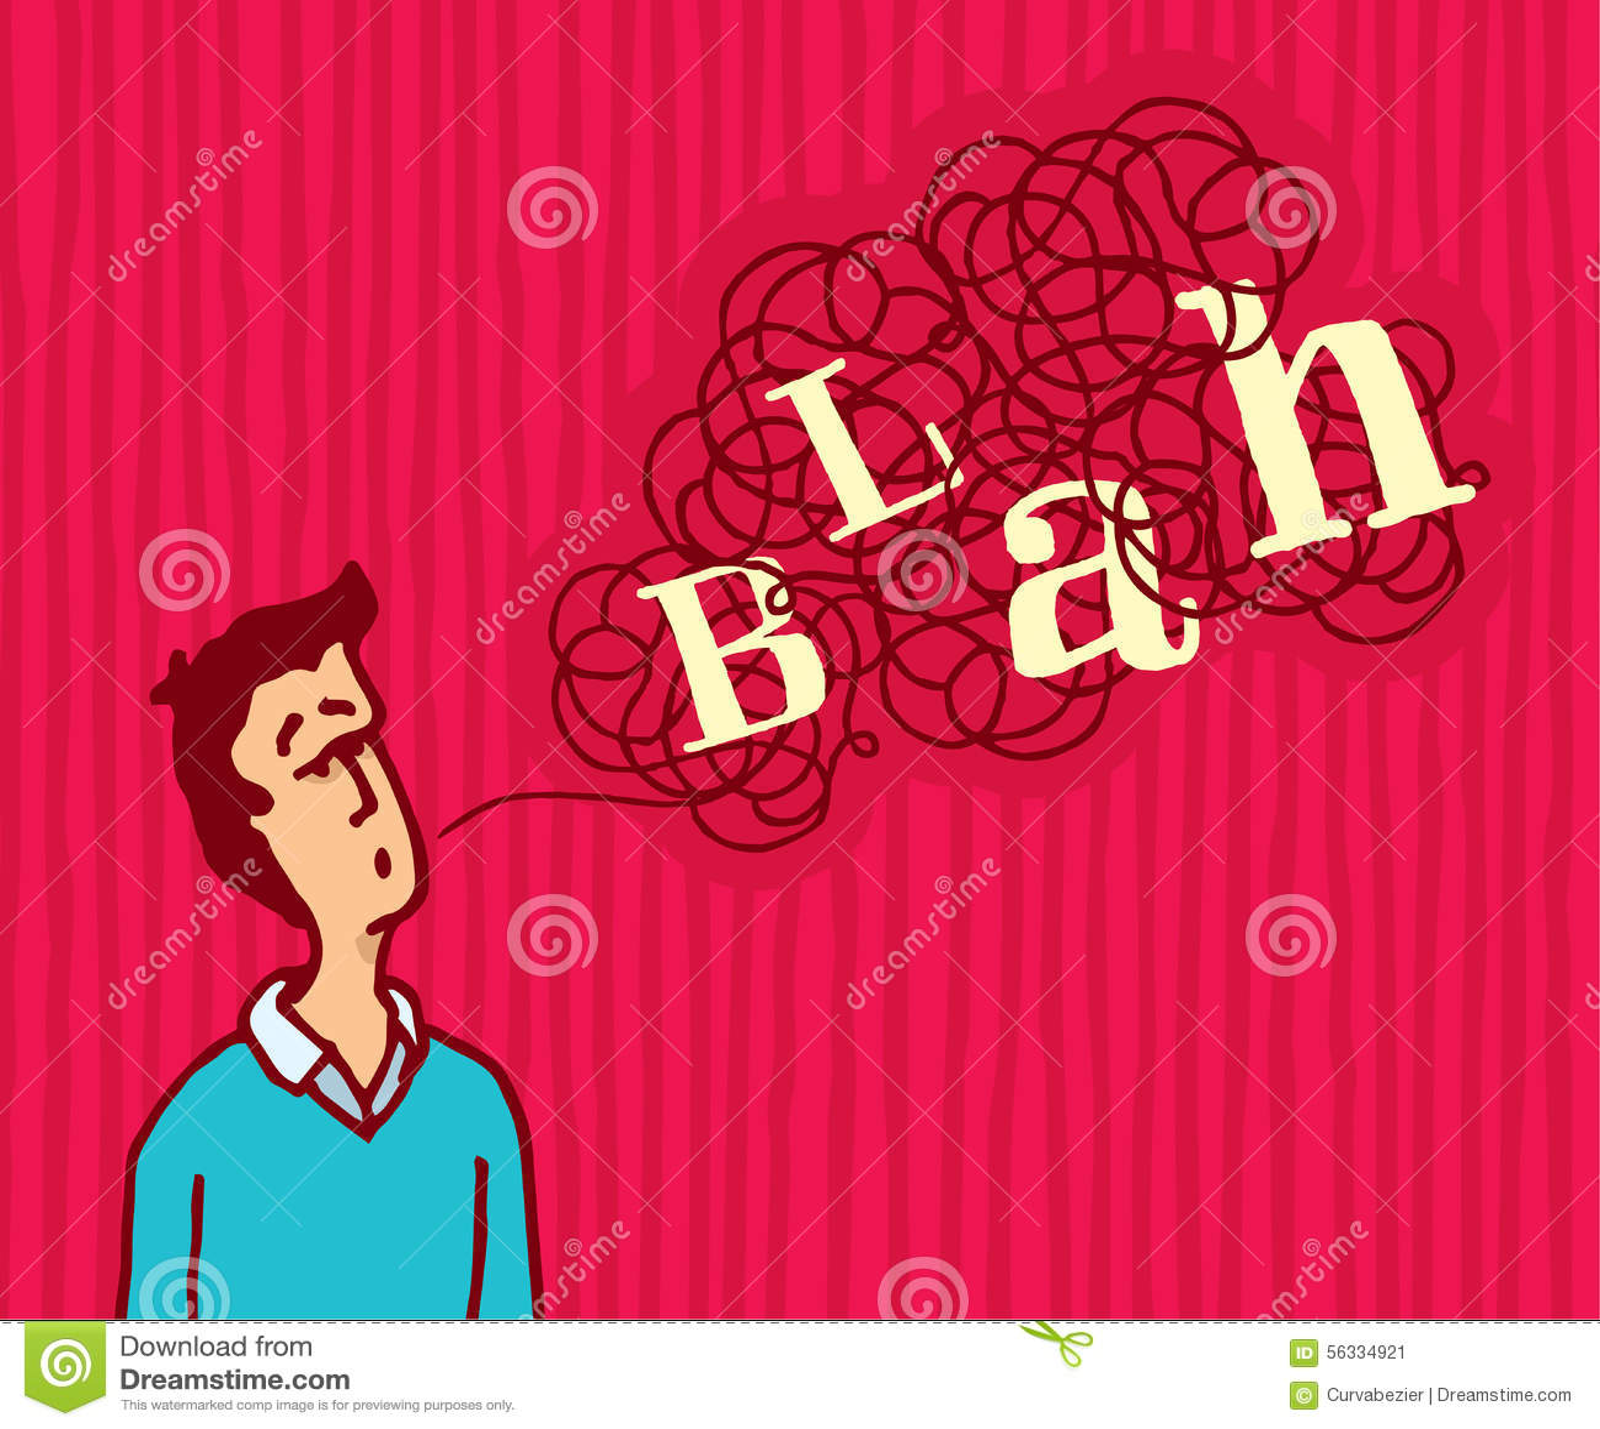 that thing candelo blah blah Blah blah blah by gershwin by josephine5flores5tam in jazz.